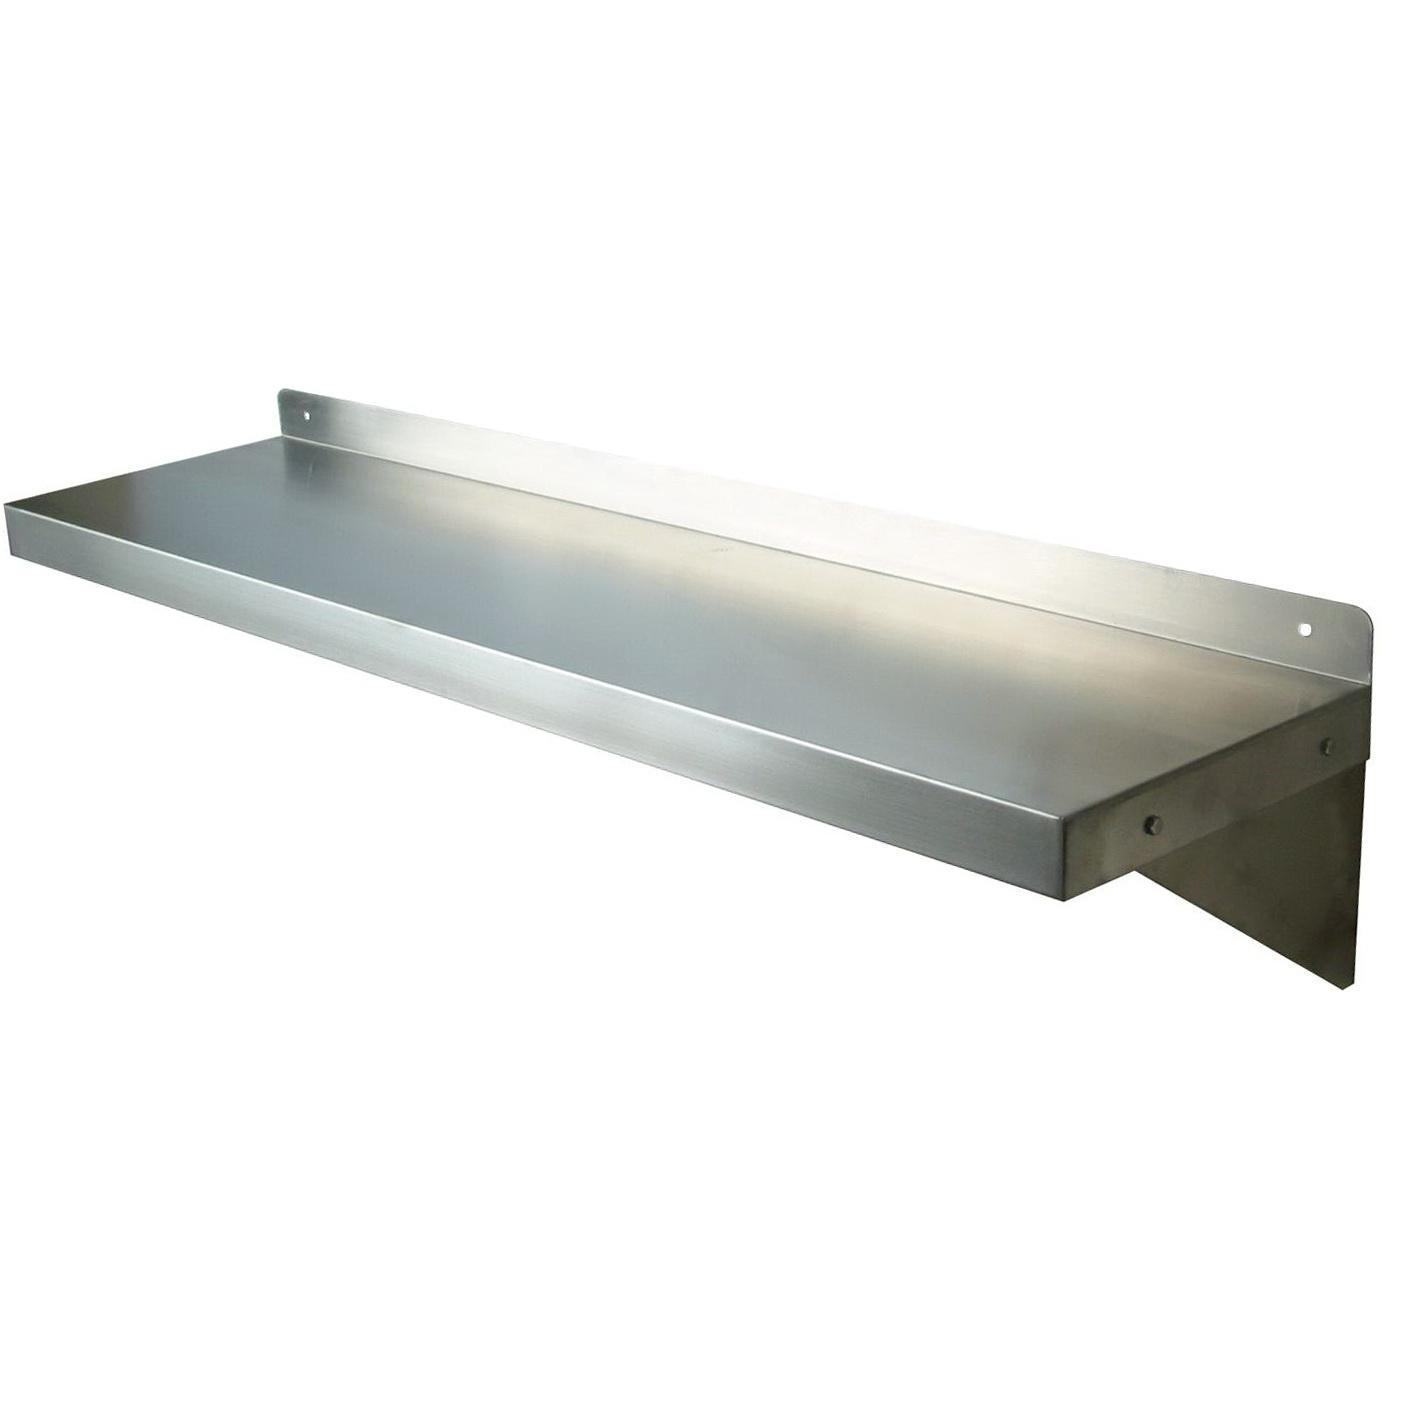 Stainless Steel Wall Shelf Kitchen